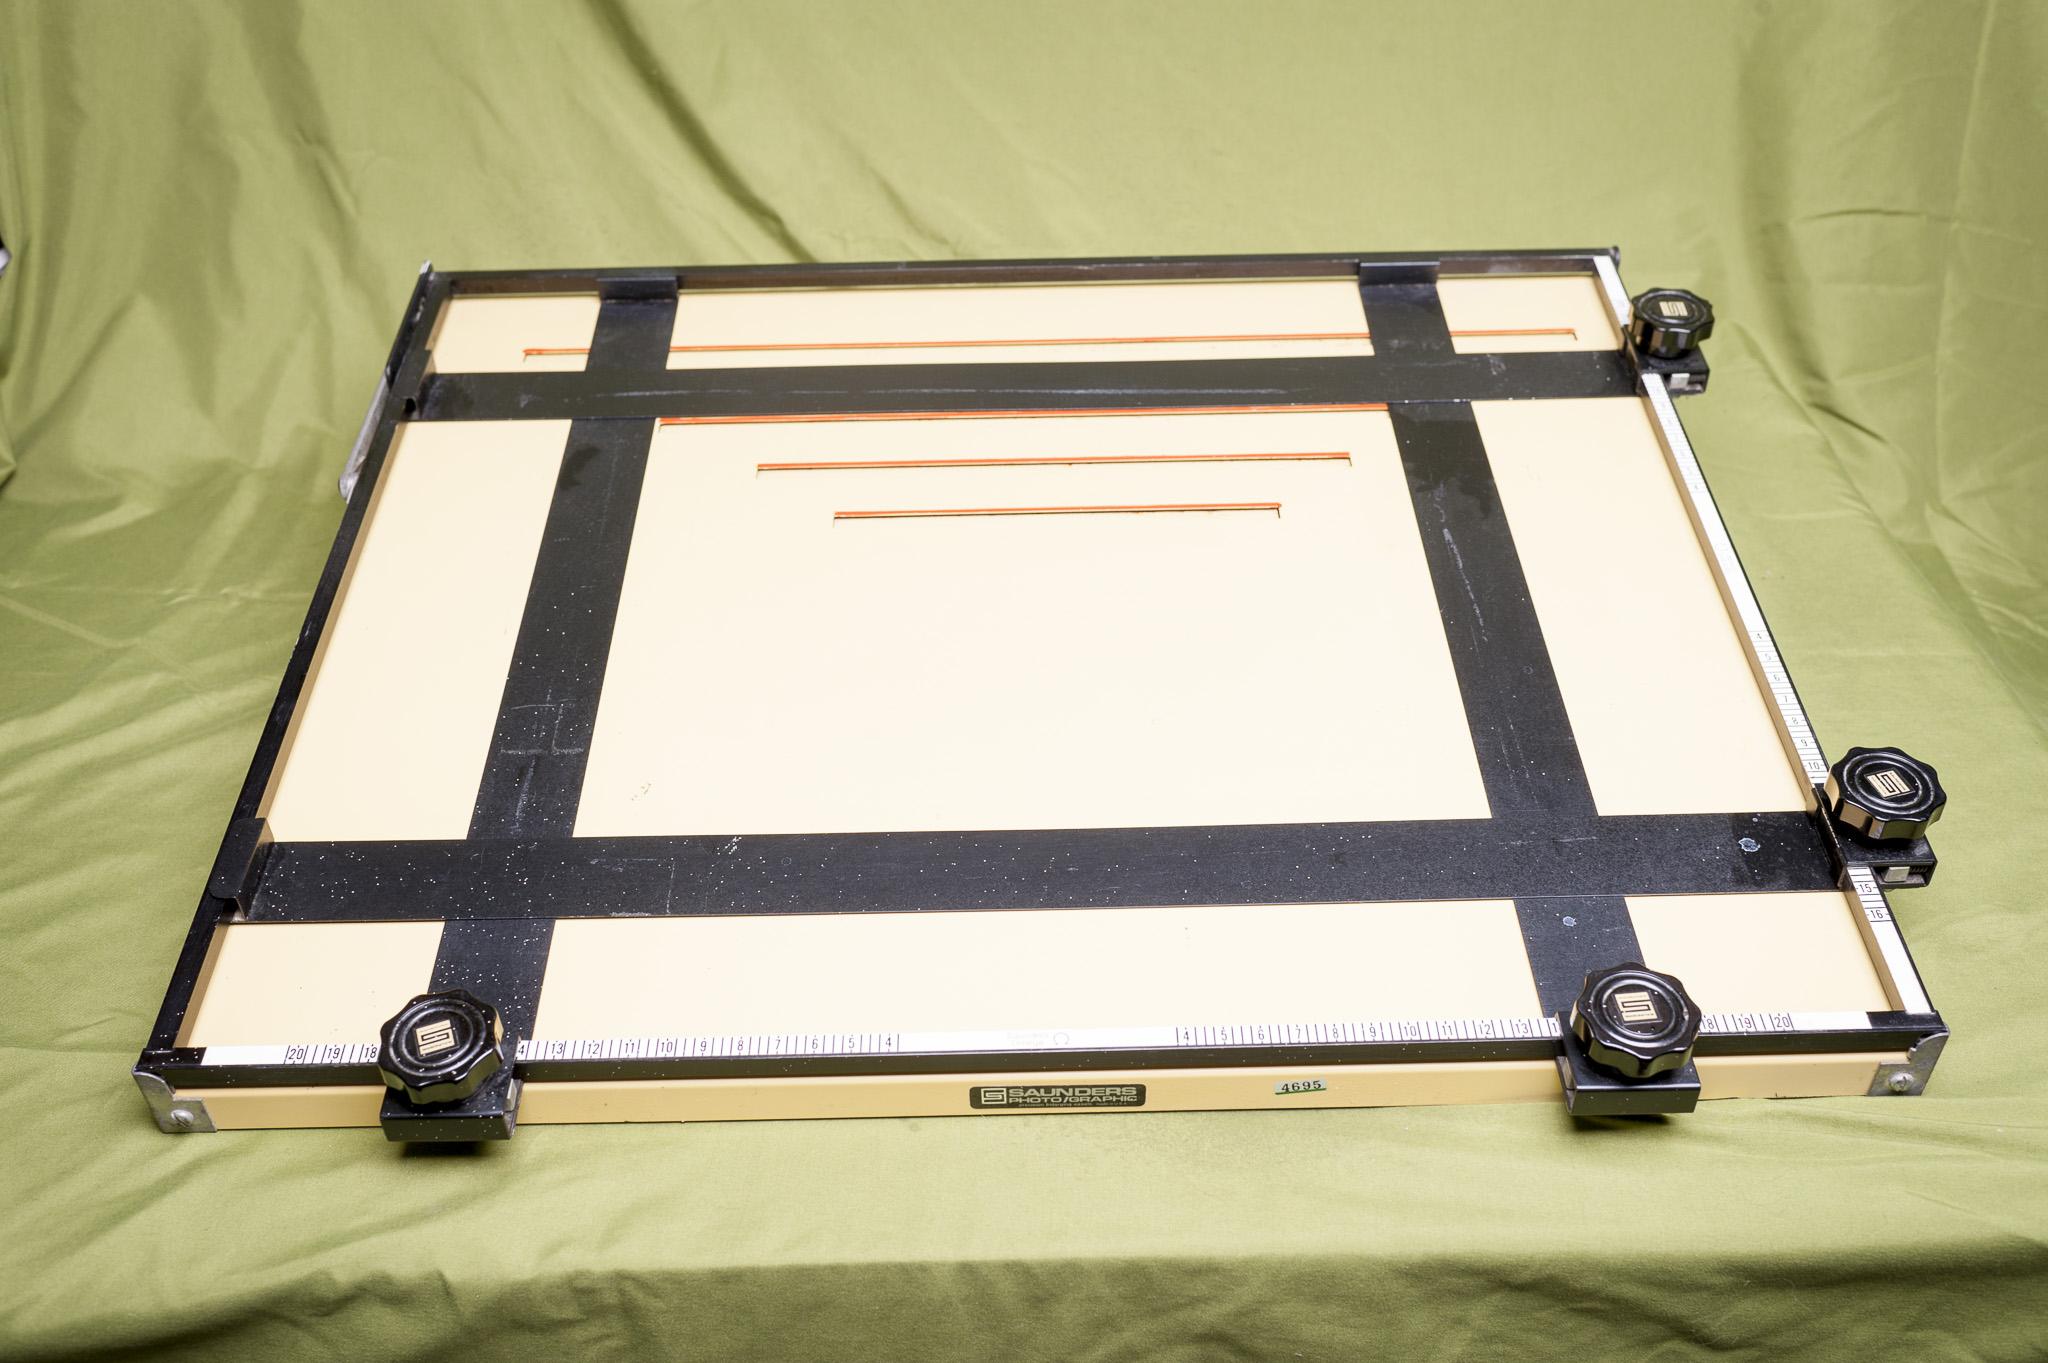 FS: Darkroom gear, Salt Hill easel, Saunders UA1620